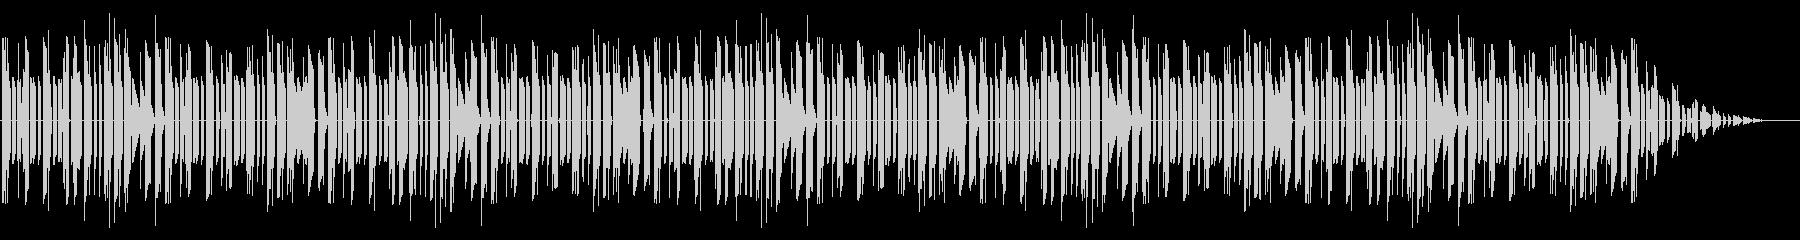 NES 汎用 B02-1(ステージ) の未再生の波形